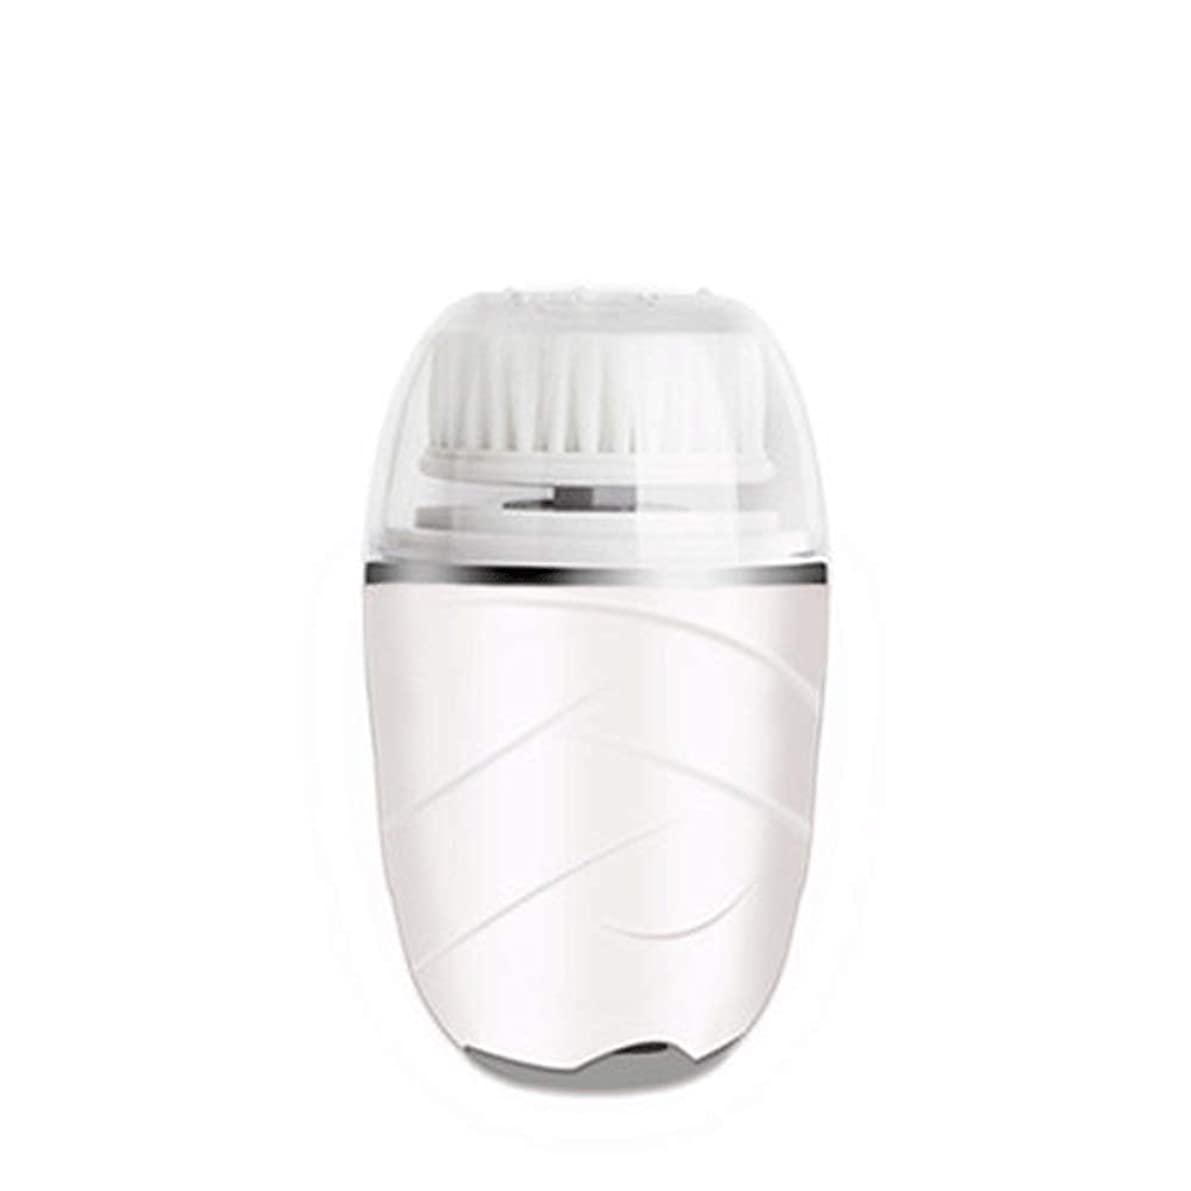 HEHUIHUI- クレンジングブラシ、防水ディープクレンジングポア、電気剥離、にきび、アンチエイジングクレンジングブラシ(ピンク) HHH (Color : White)